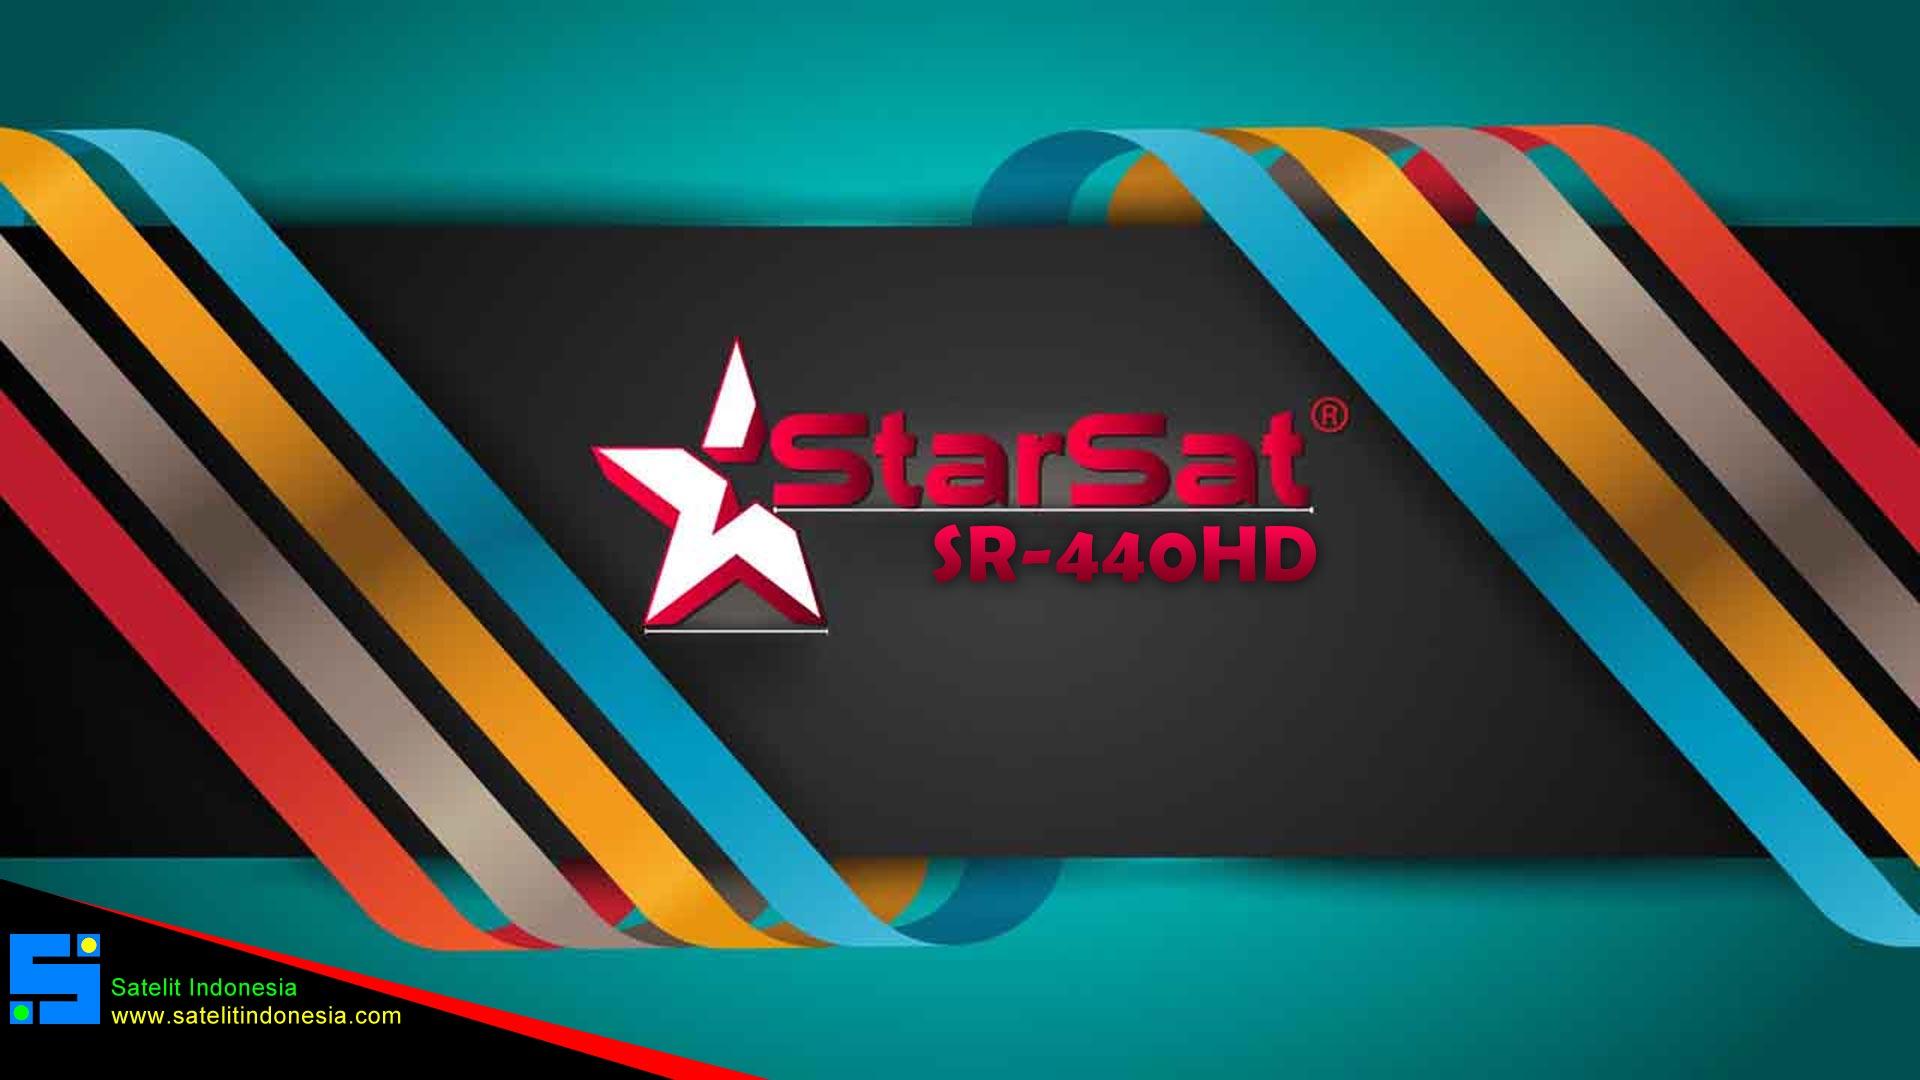 Starsat SR-440 HD Software New Update Firmware Receiver